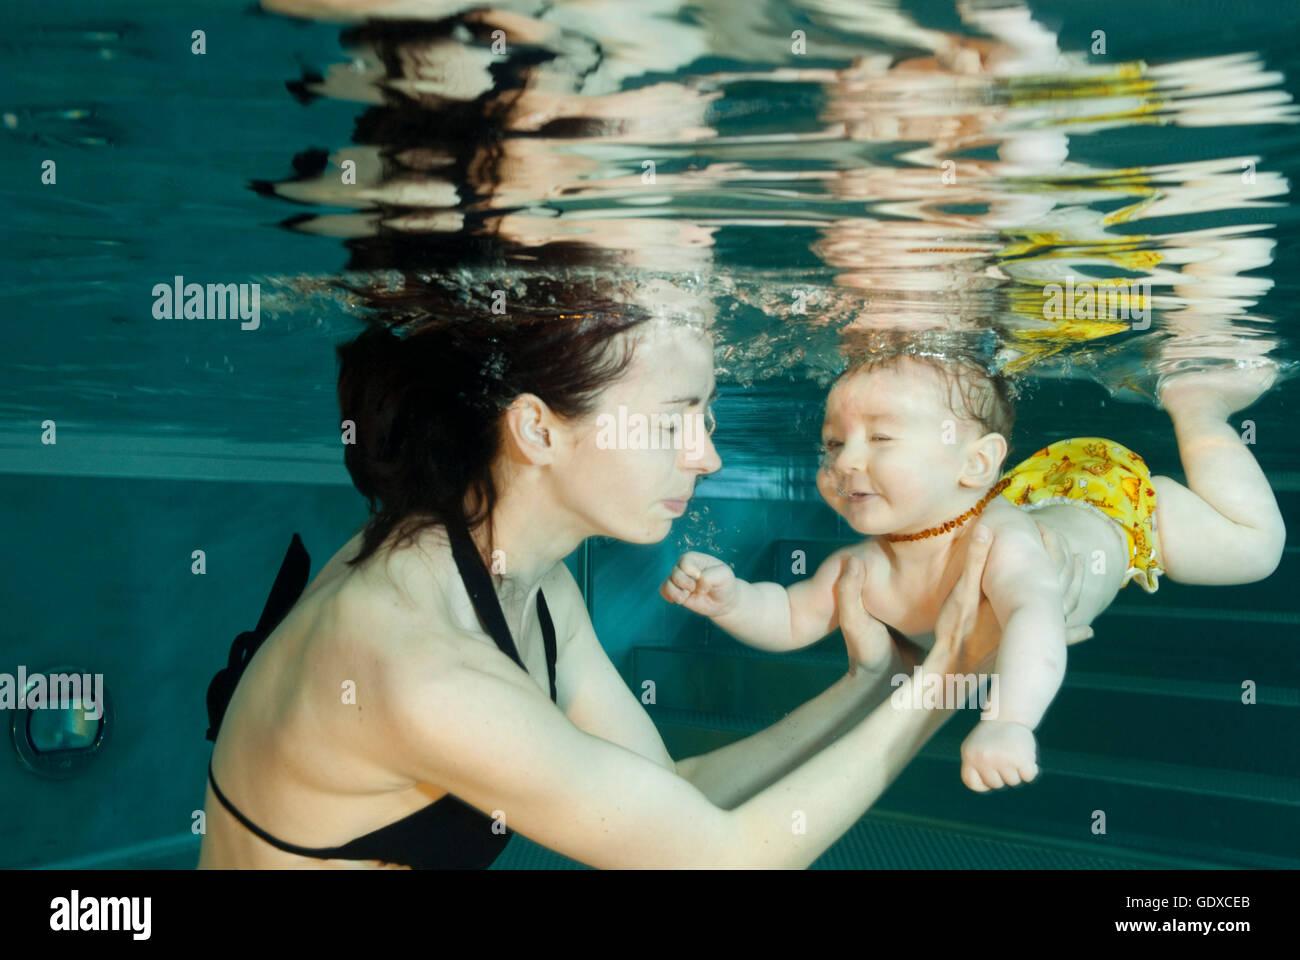 Babyswimming - Stock Image